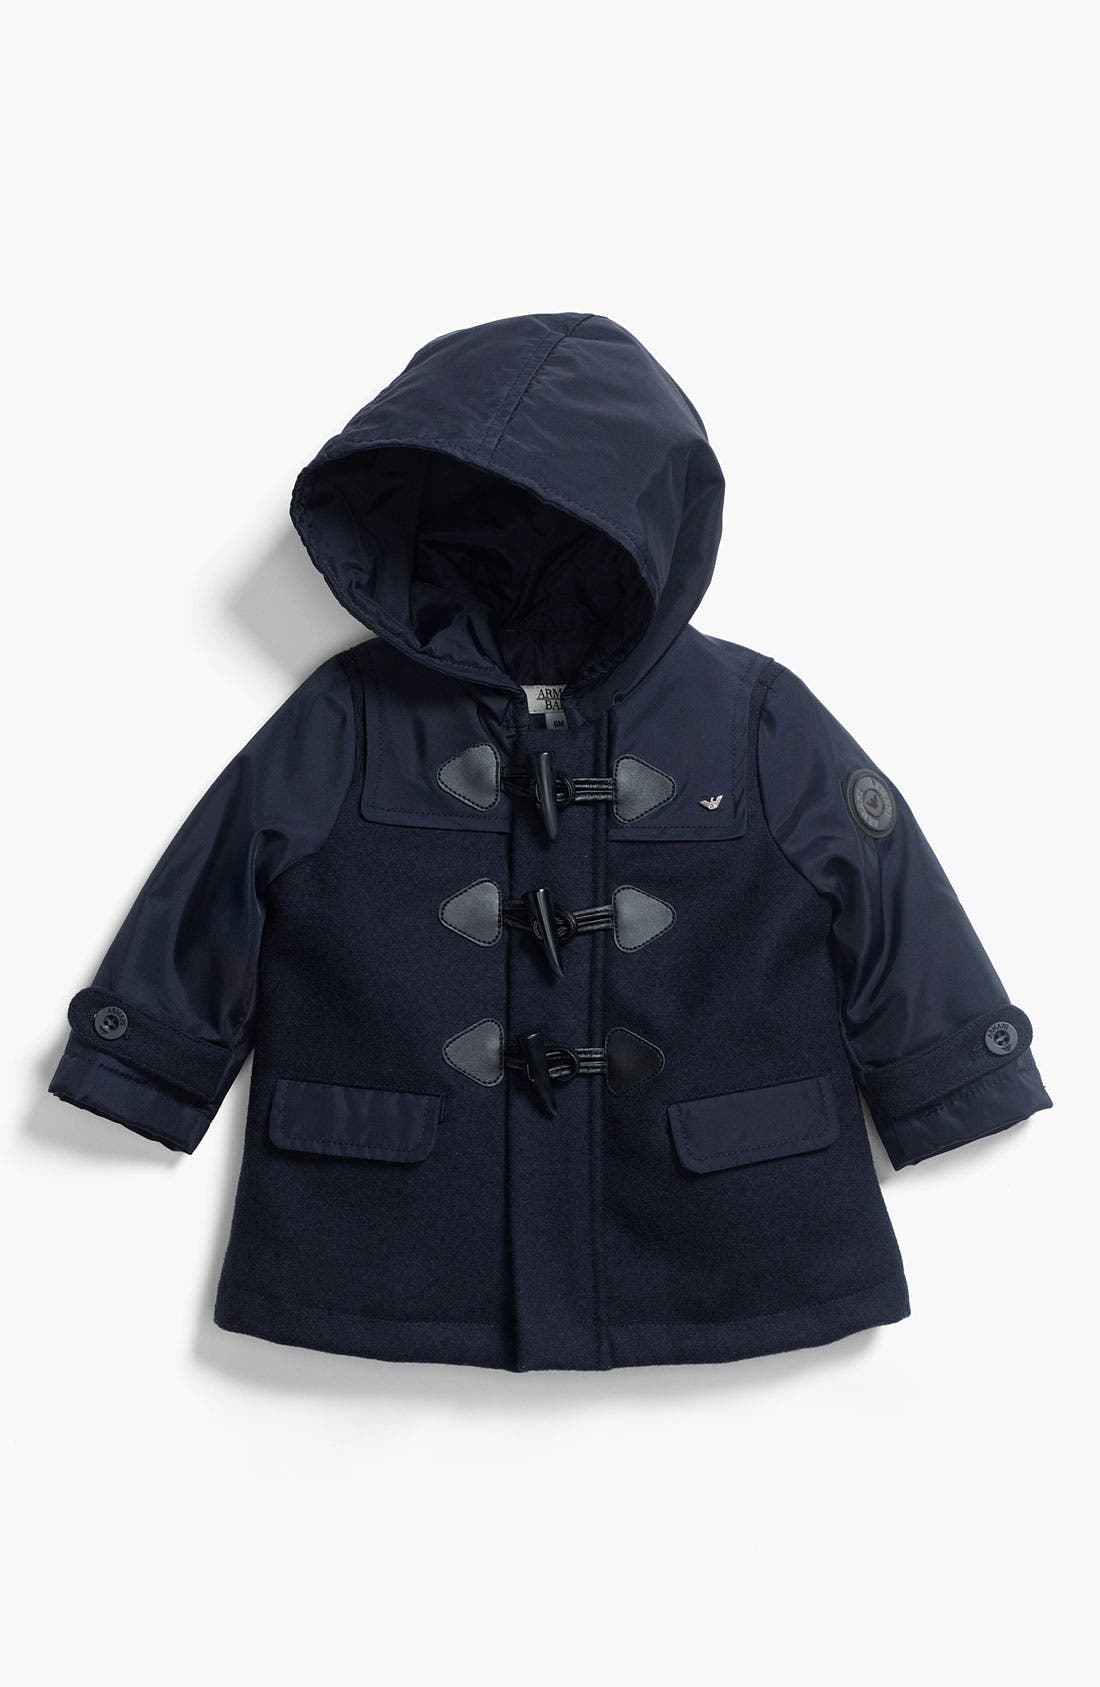 Alternate Image 1 Selected - Armani Junior Toggle Coat (Infant)